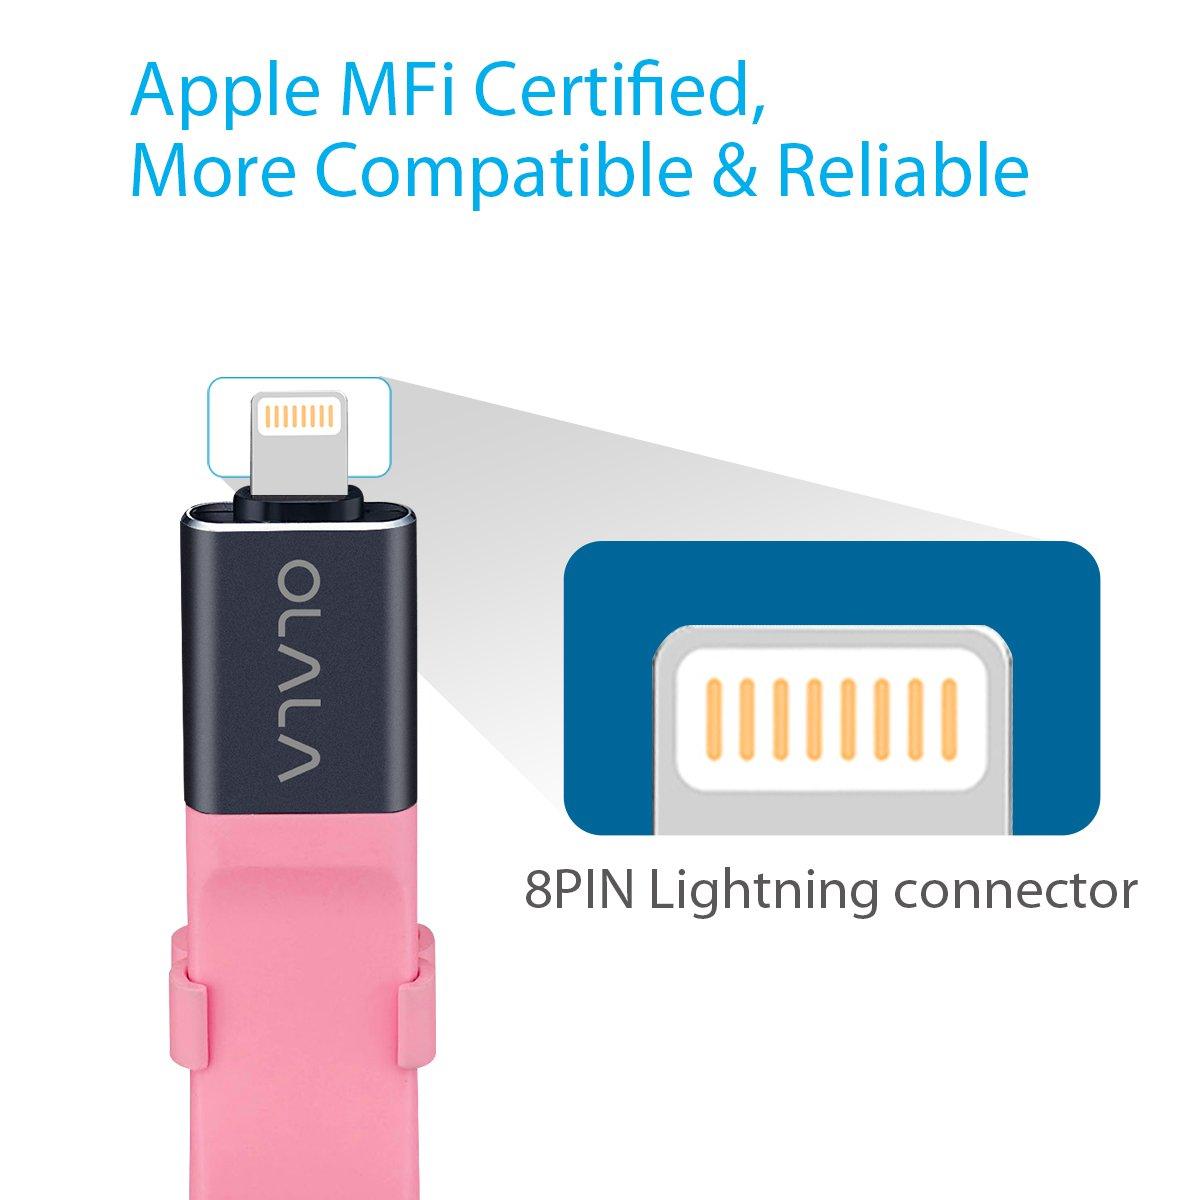 Apple MFI Certified Silver iPhone Lightning Flash Drive OLALA 32GB USB 3.0 Memory Stick Thumb Pen Drive Jump Drive IOS External Storage Expansion for iPhone iPad Mac iOS PC Laptops